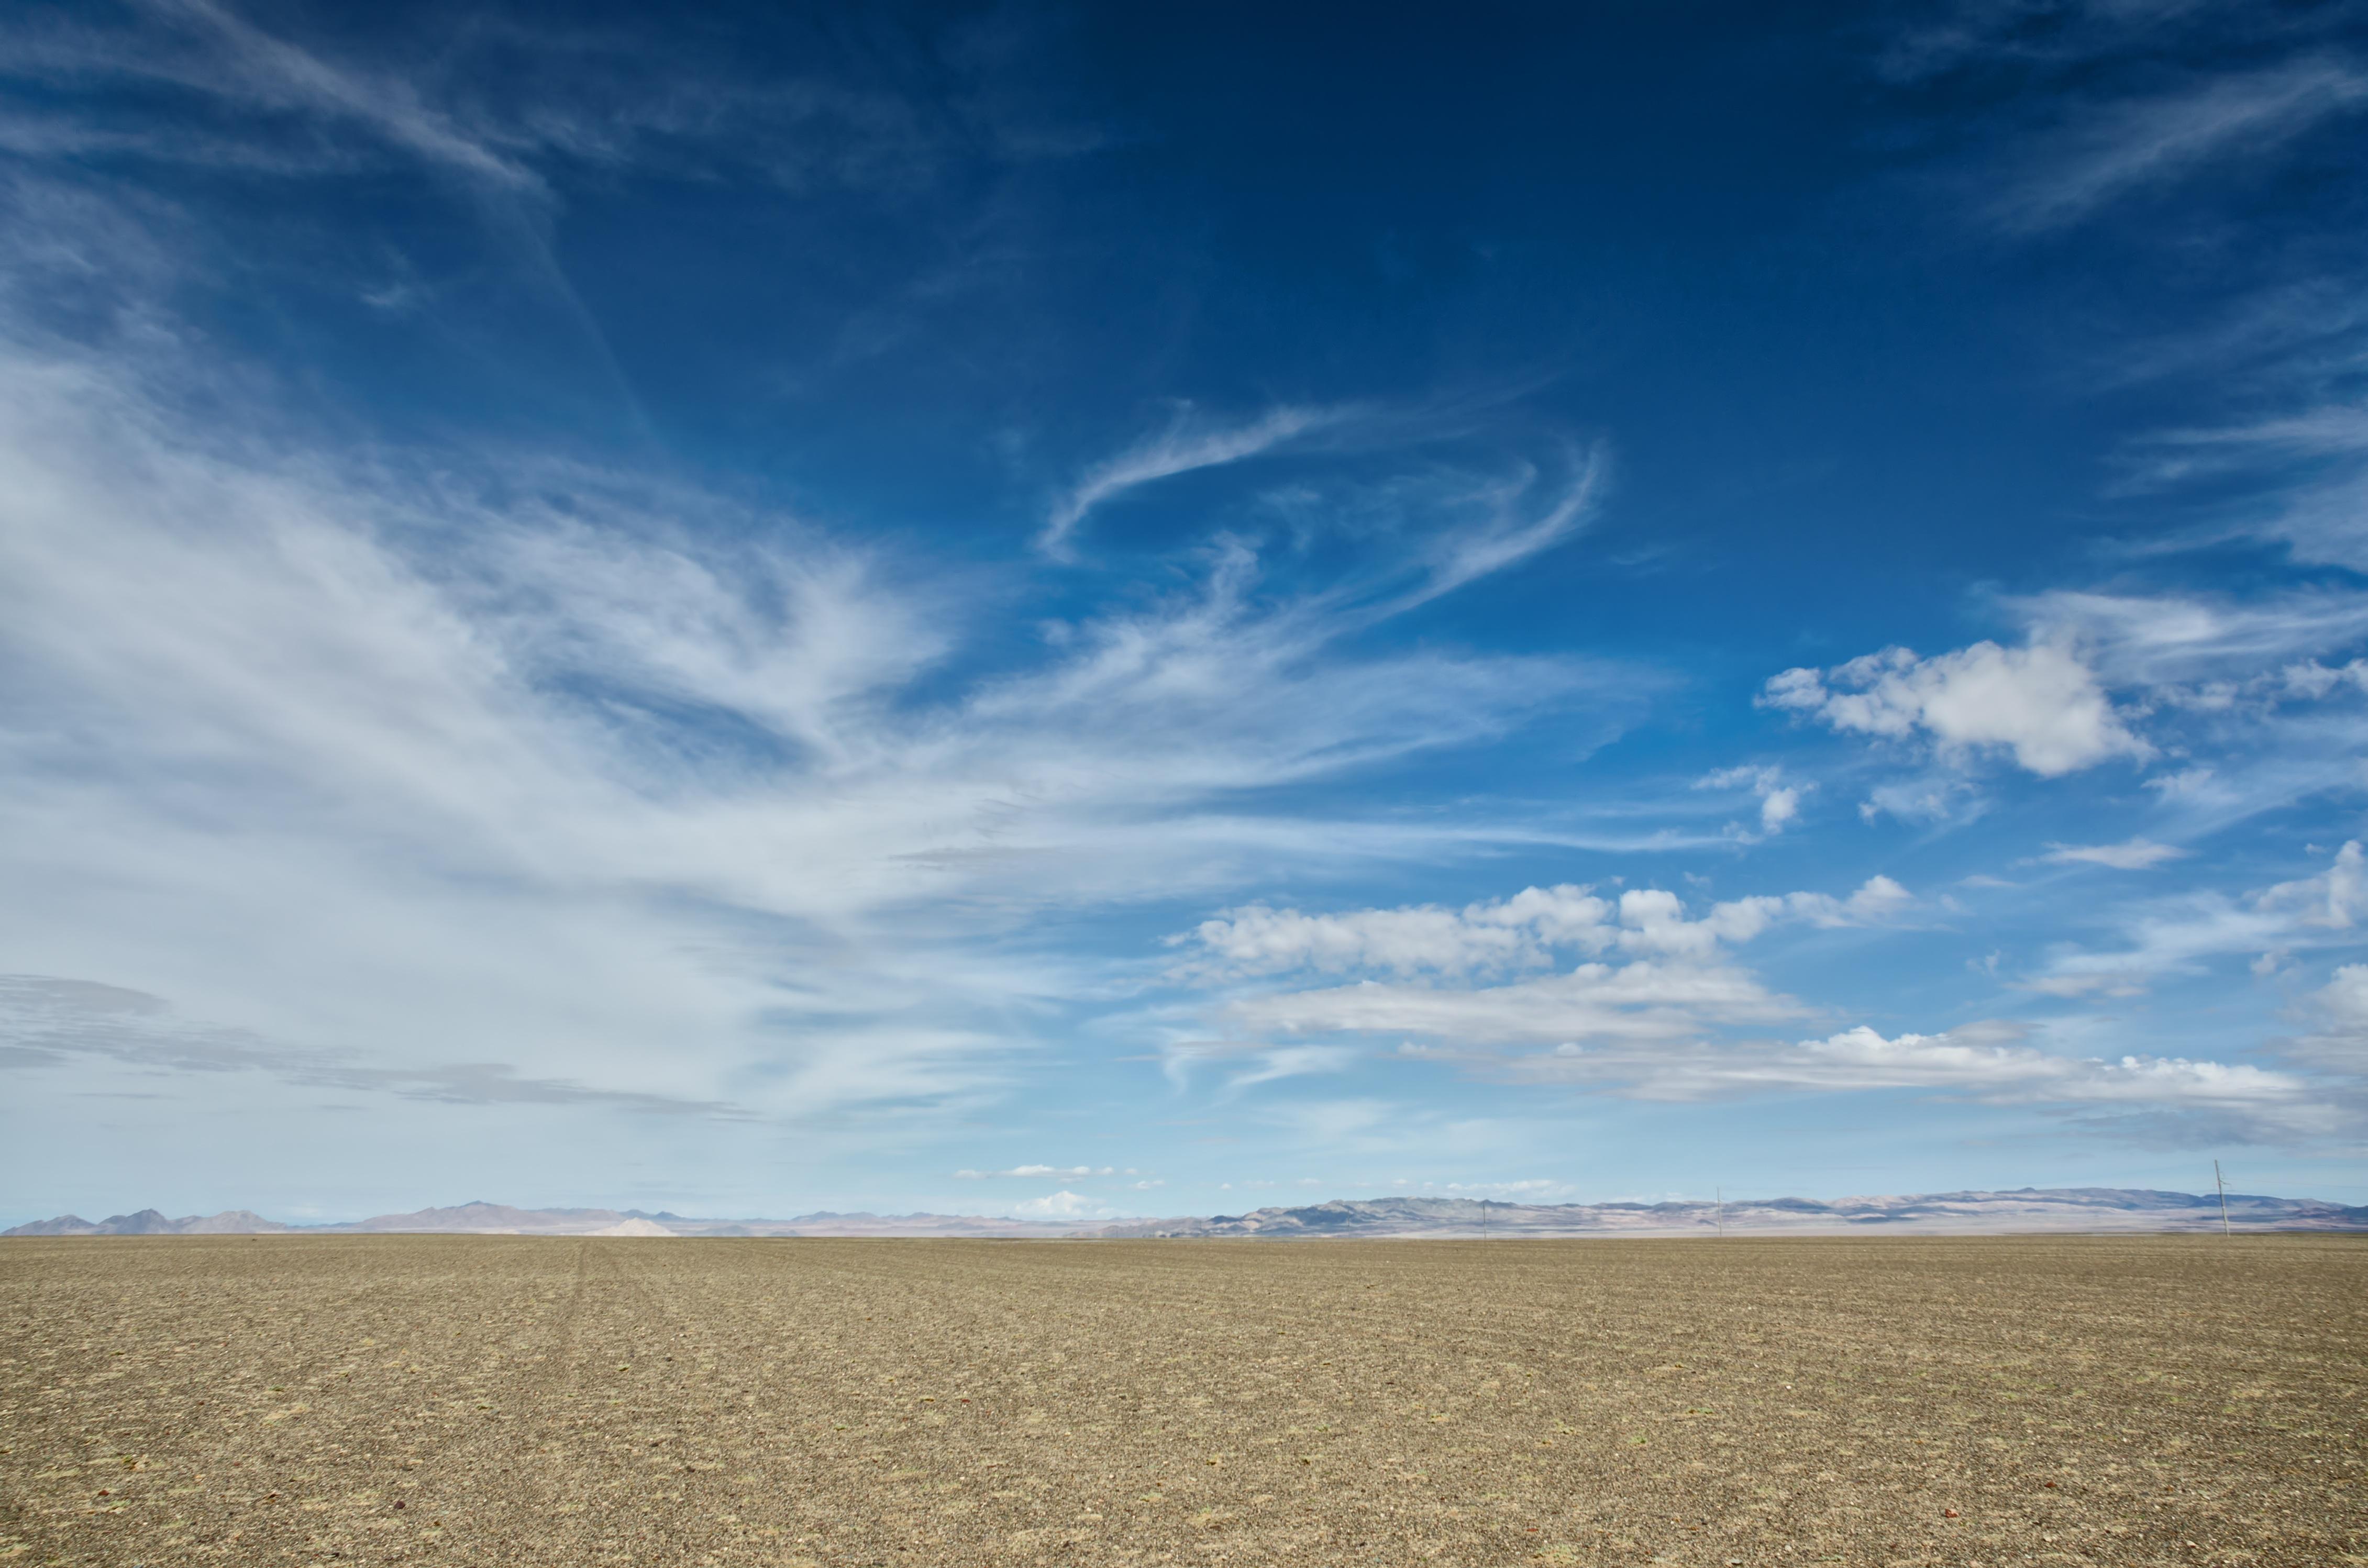 картинки небо над пустыней квартиры побыстрей